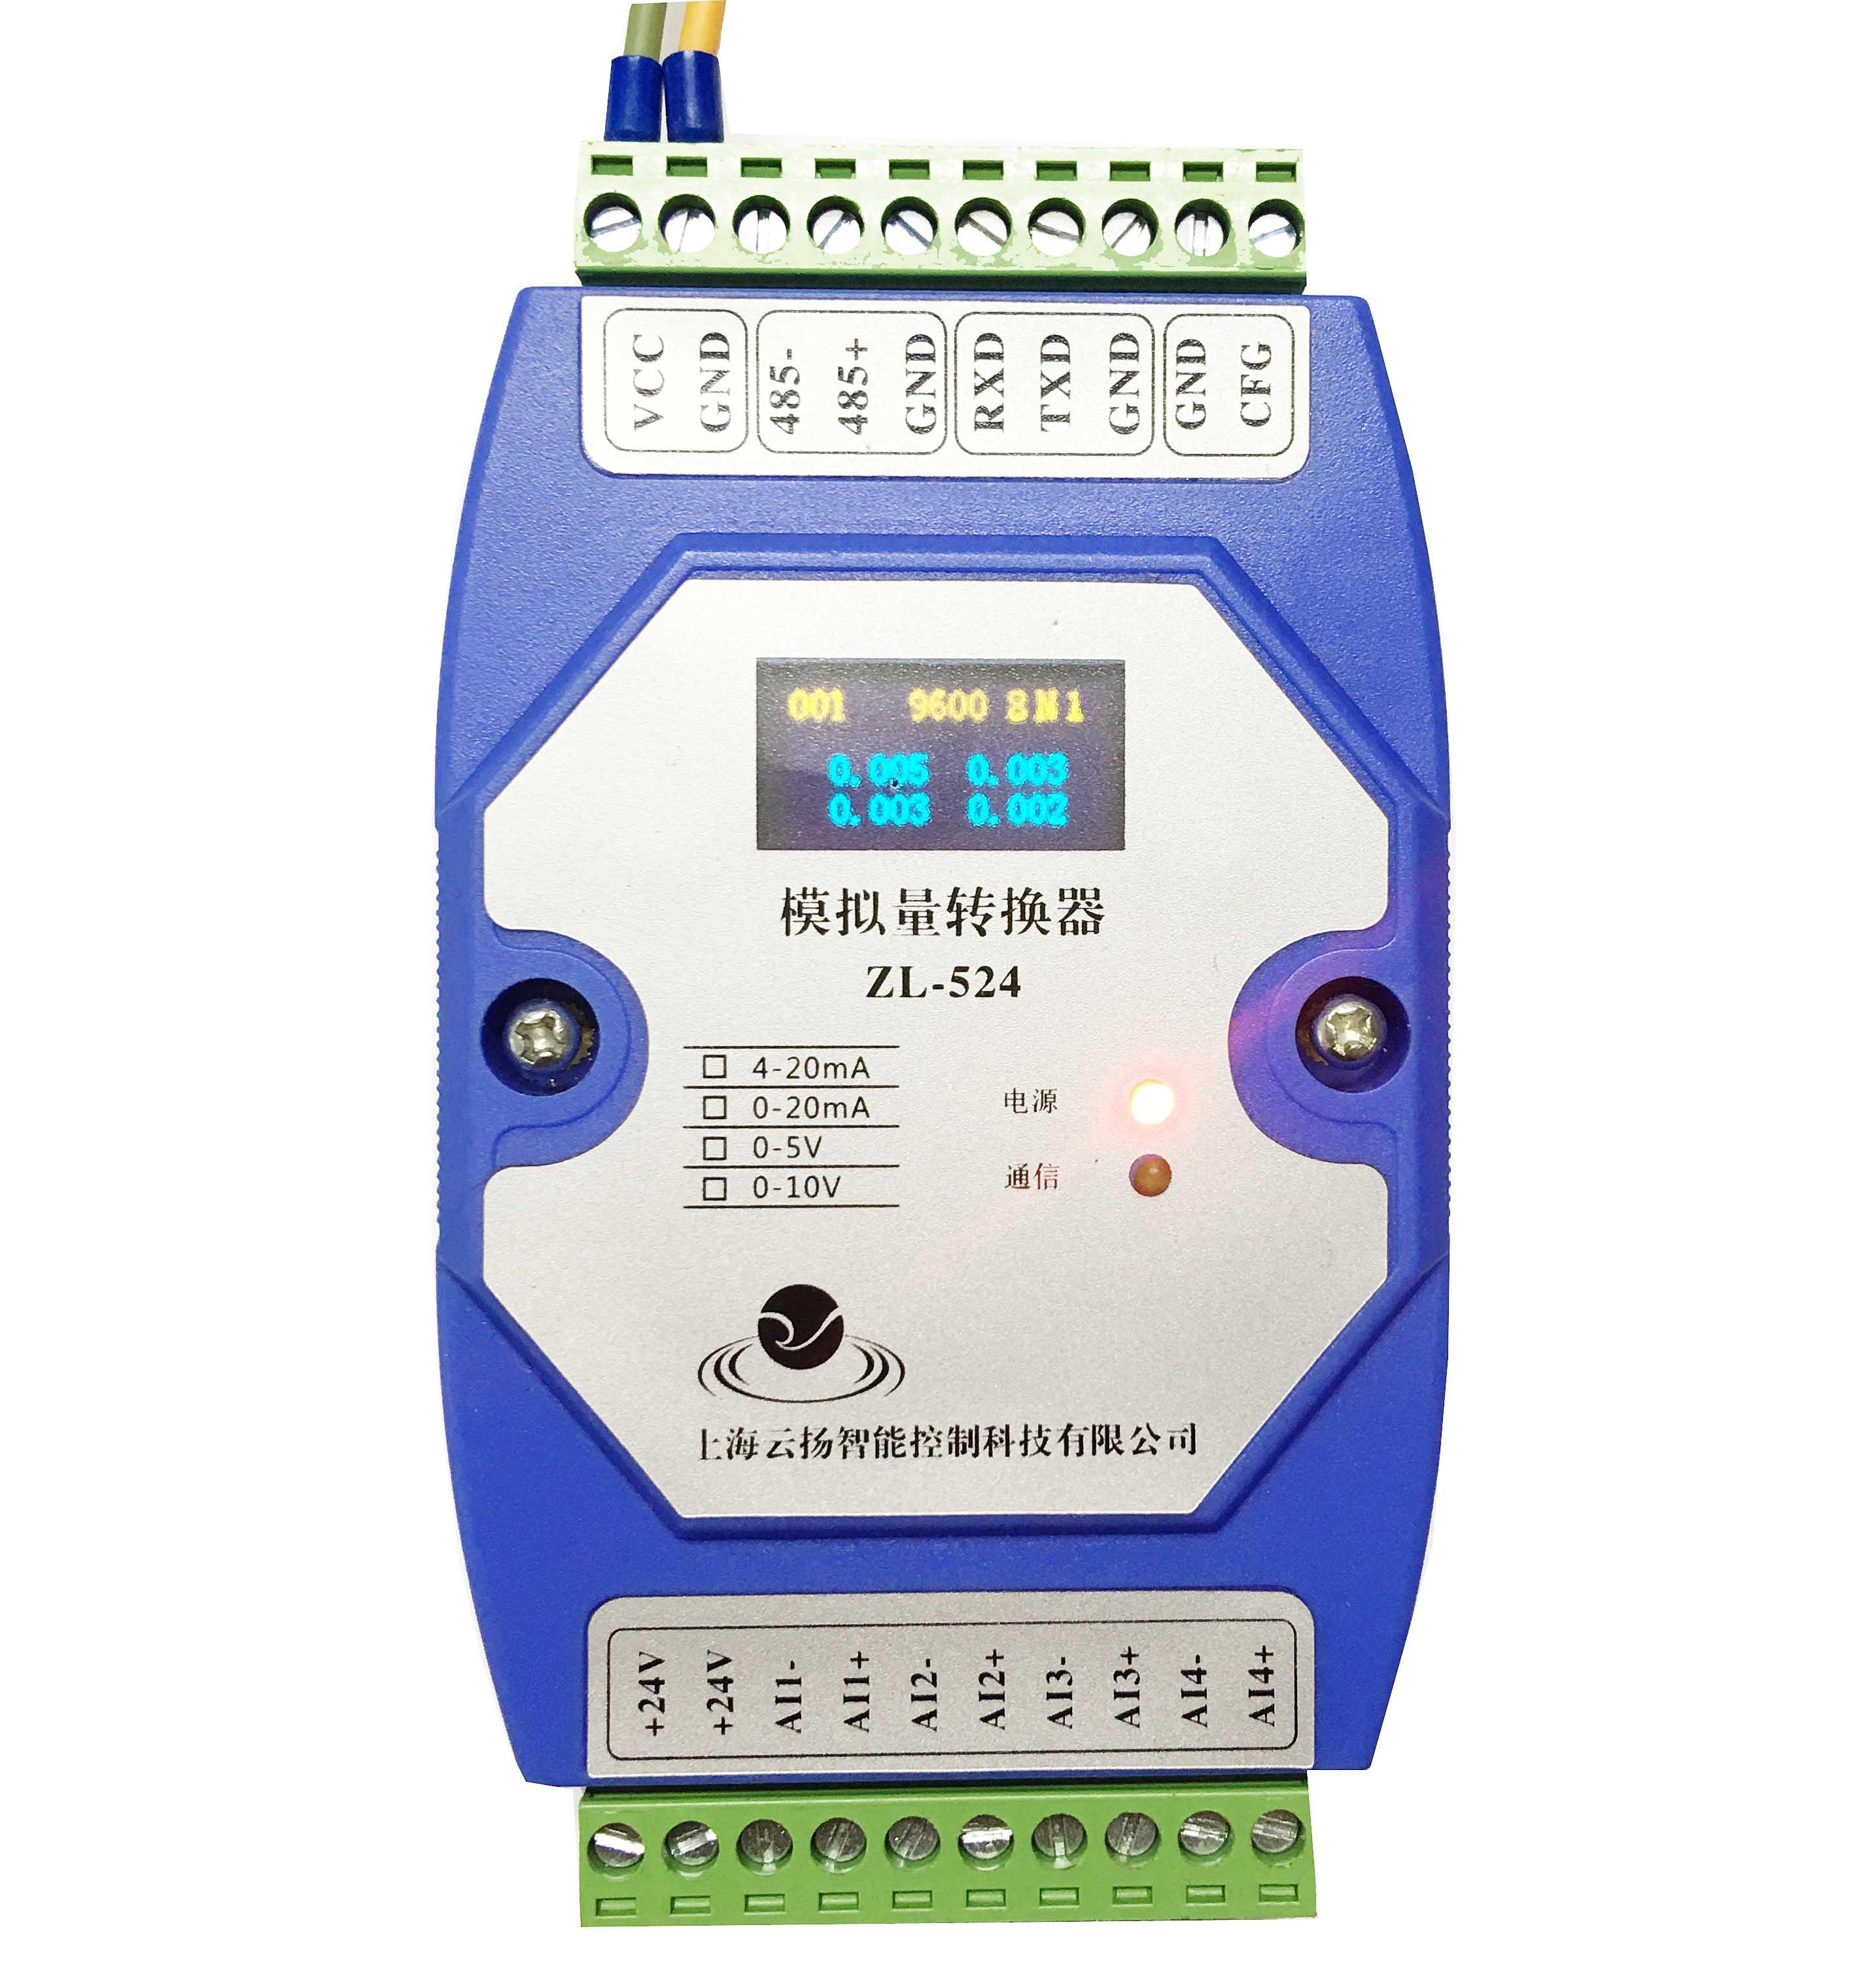 4-20mA to RS485 4 Analog Input Acquisition Module, 0-10V High-precision MODBUS-RTU